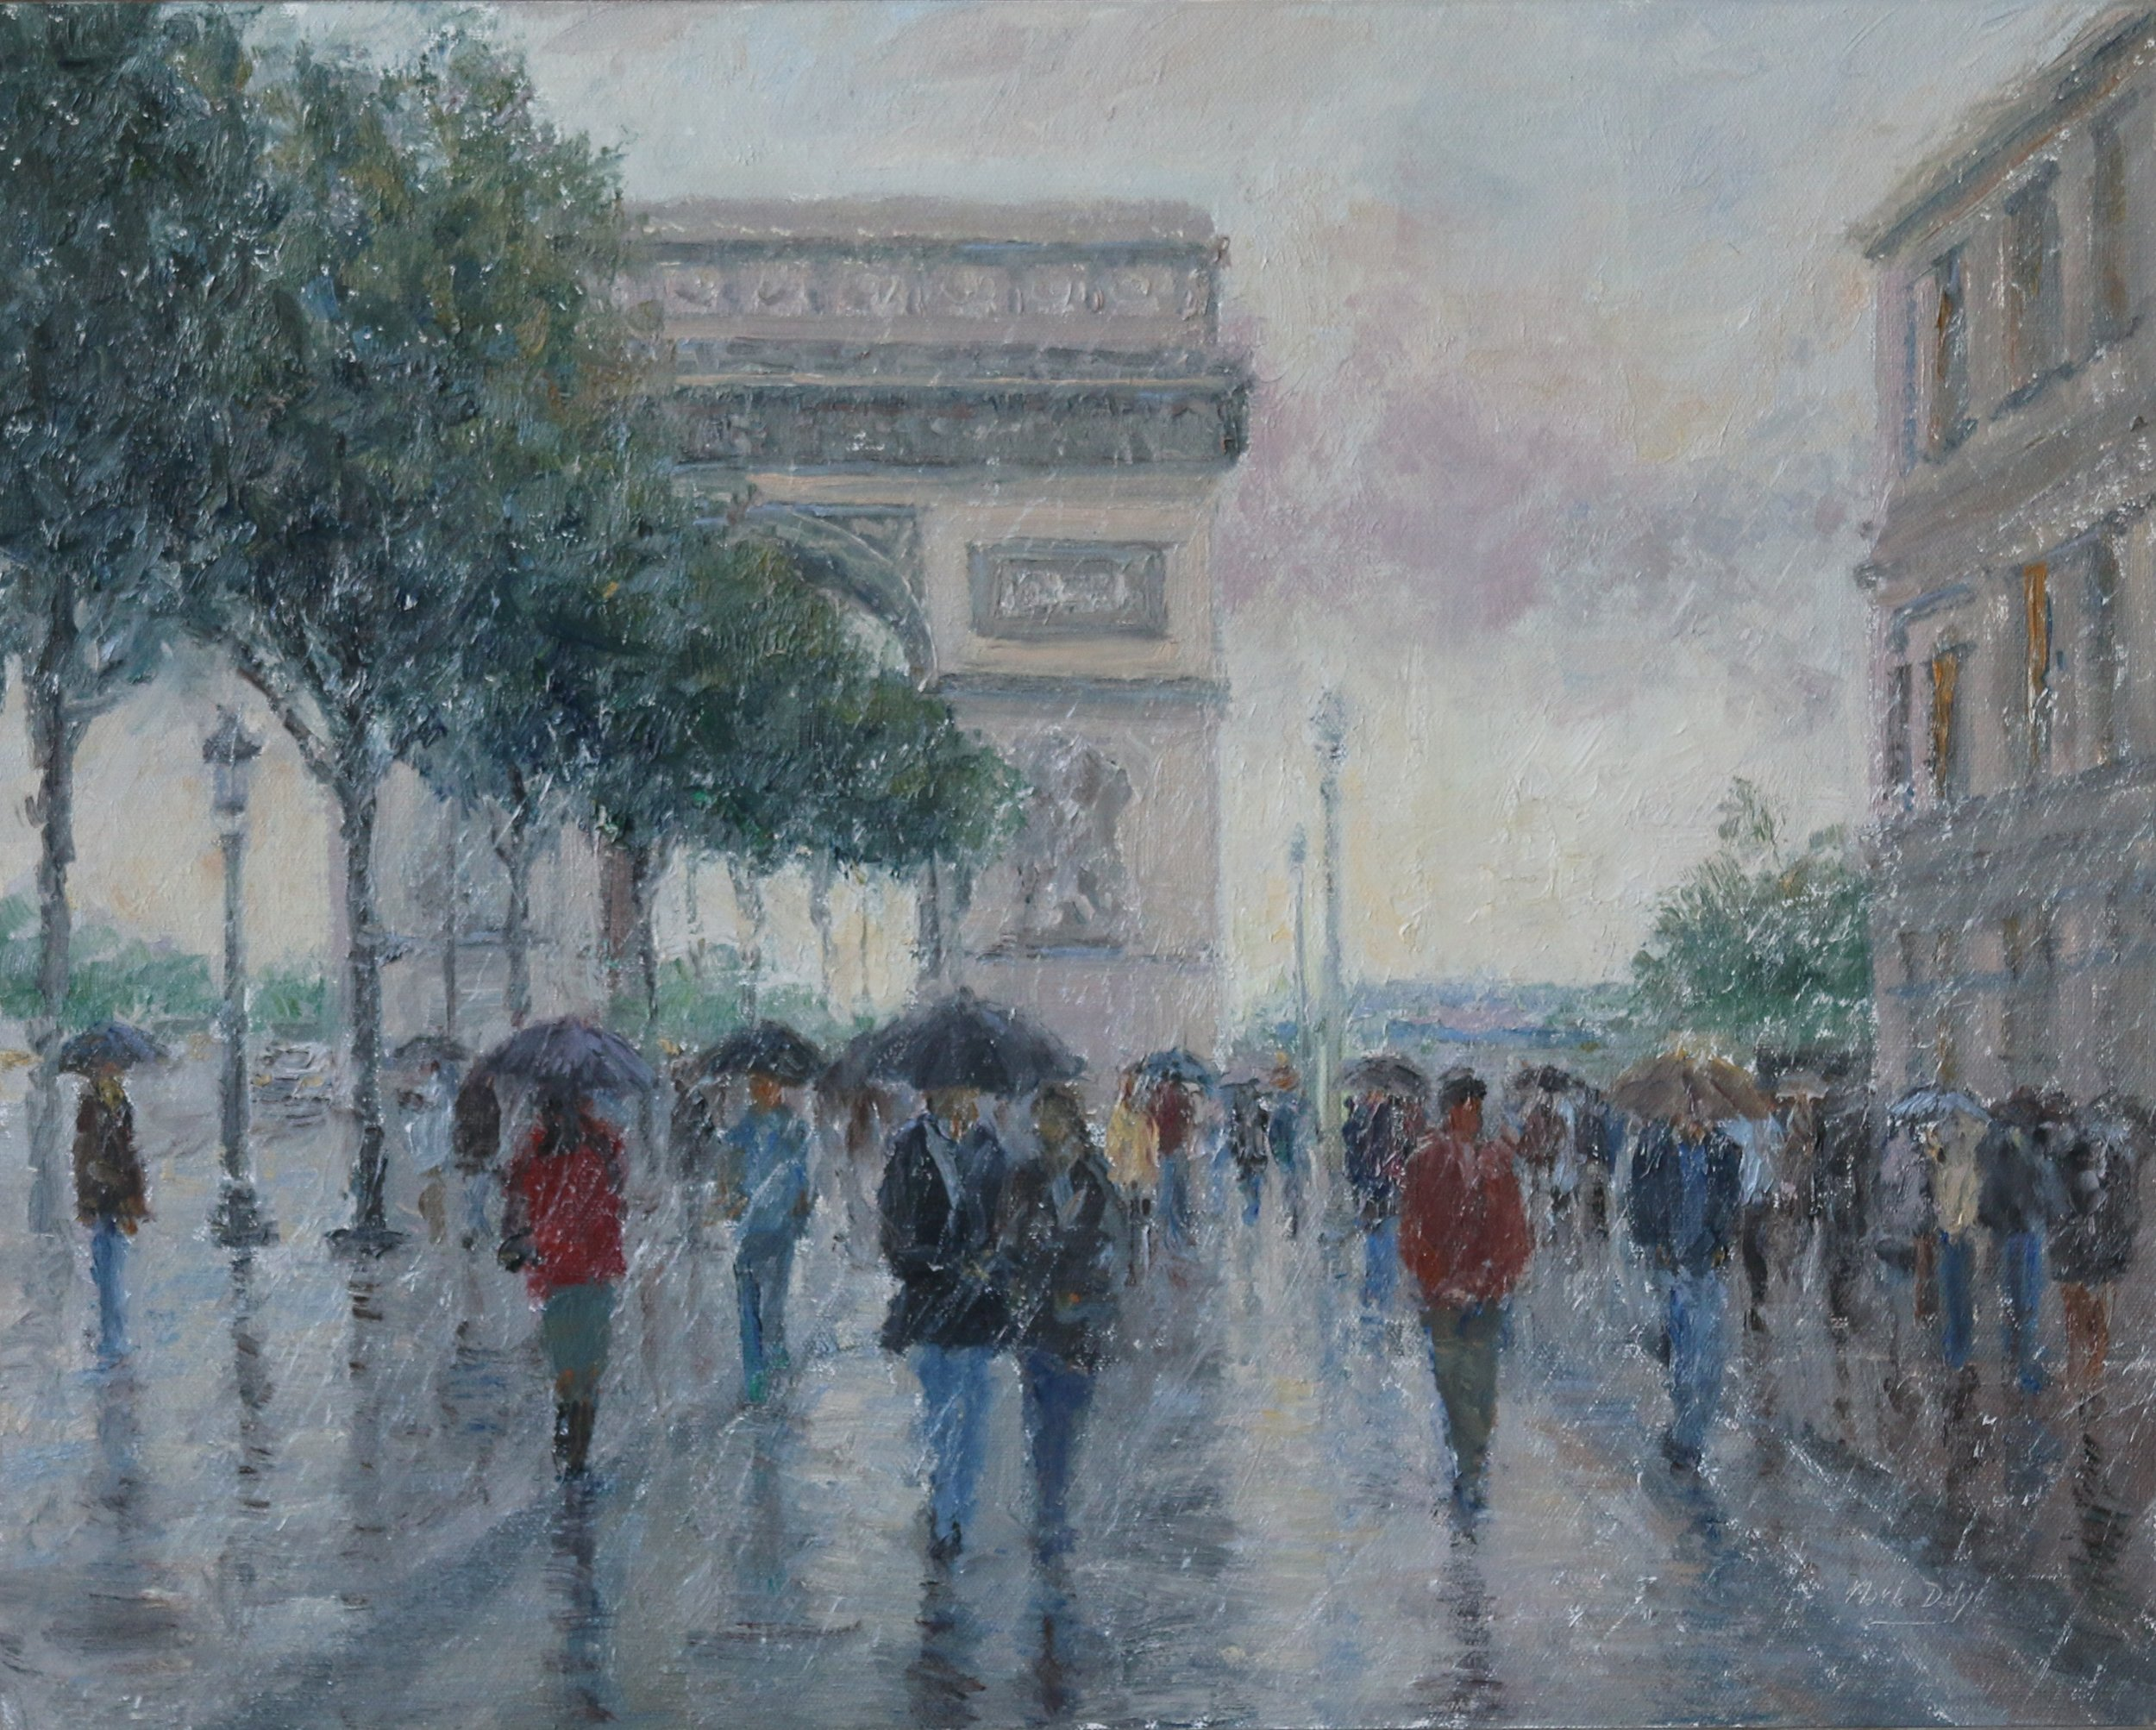 Rainy Day, Champs Elysees